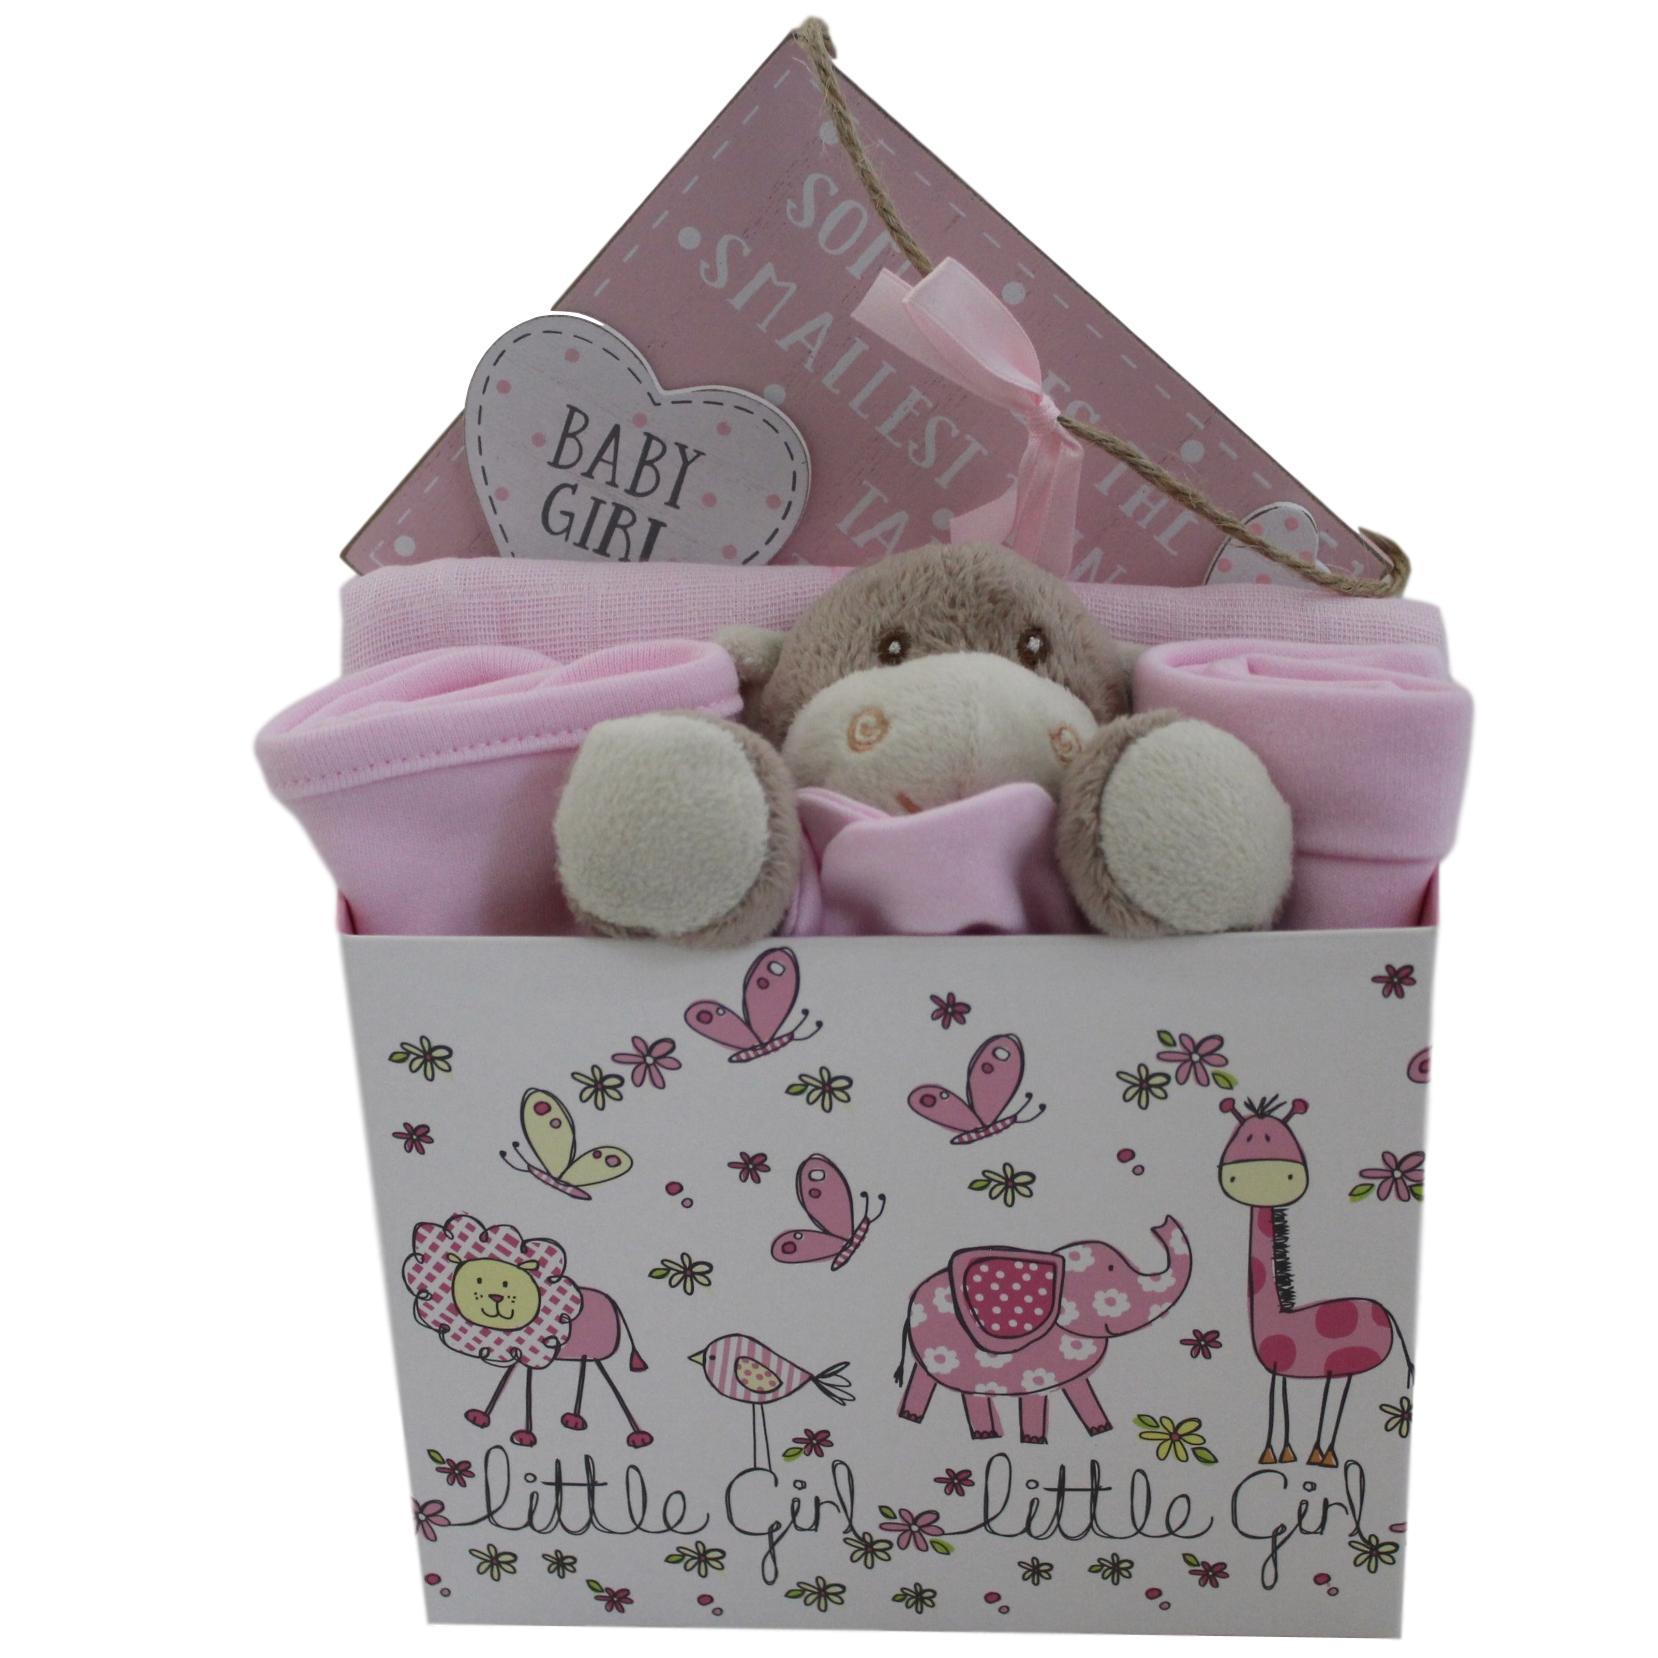 253728b4c4d6c Peek A Boo 8 Piece Baby Girl Gift Box Hamper – Baby Hamper Gift